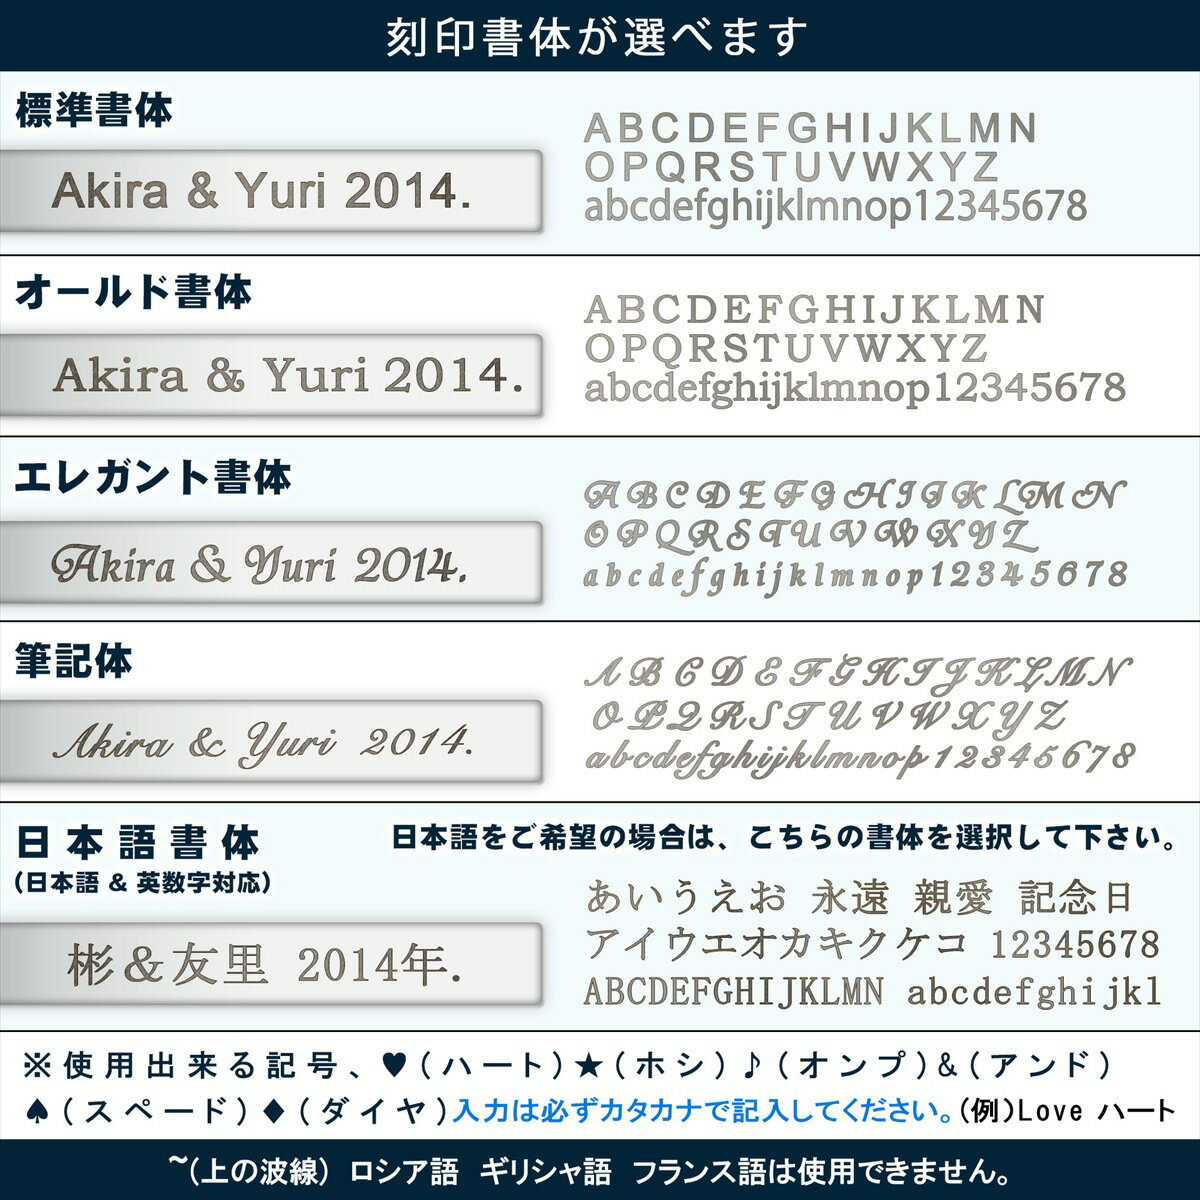 marking20141124-a3.jpg